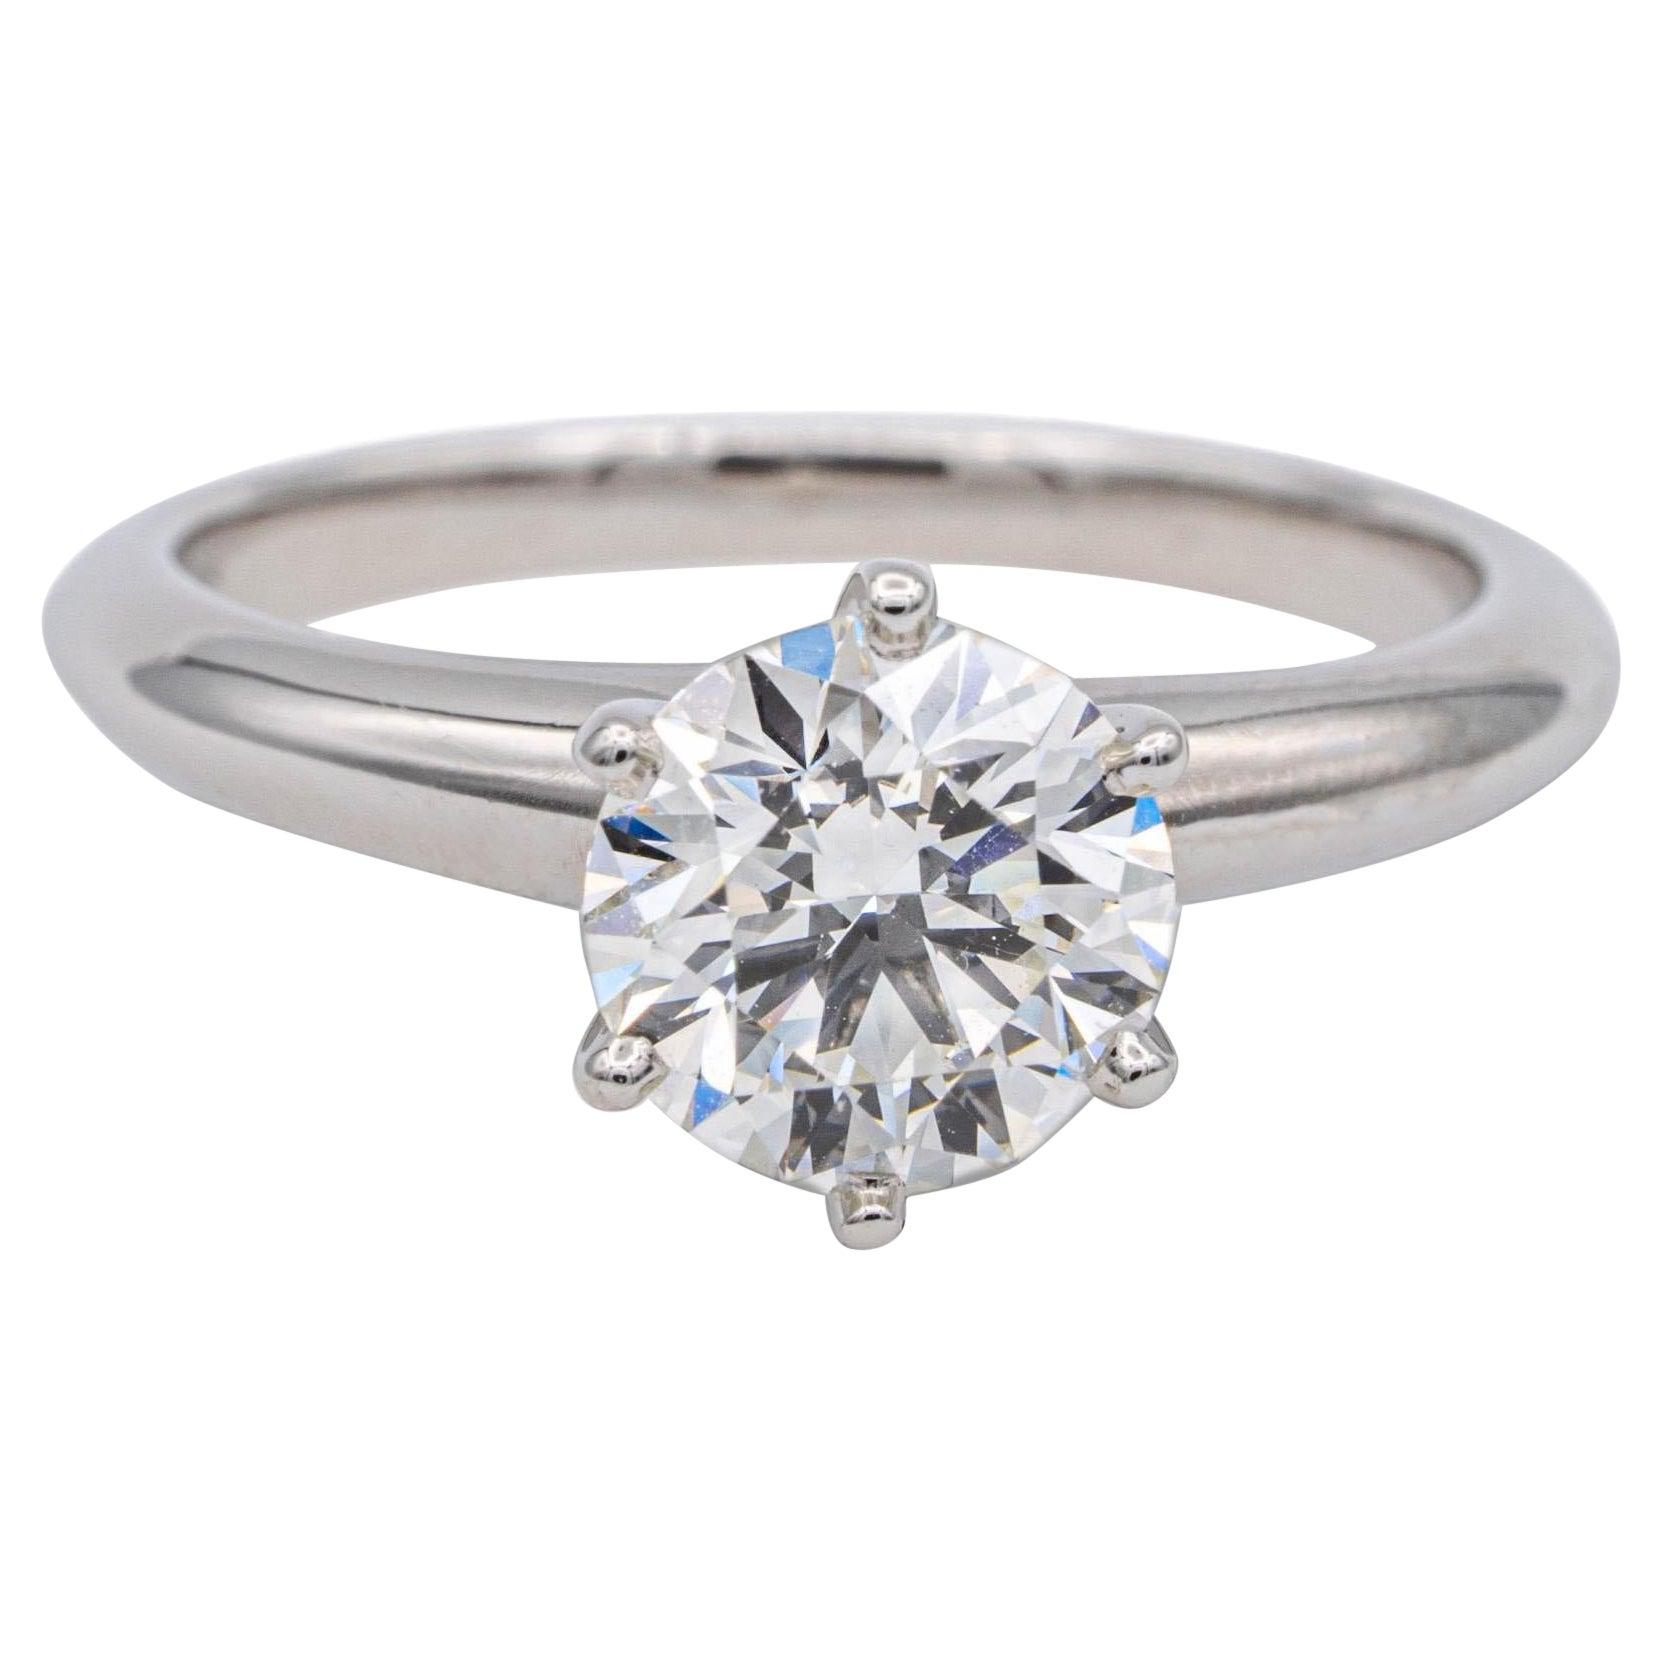 Tiffany & Co. Round Diamond Engagement Ring 1.26 Ct I VS1 in Platinum